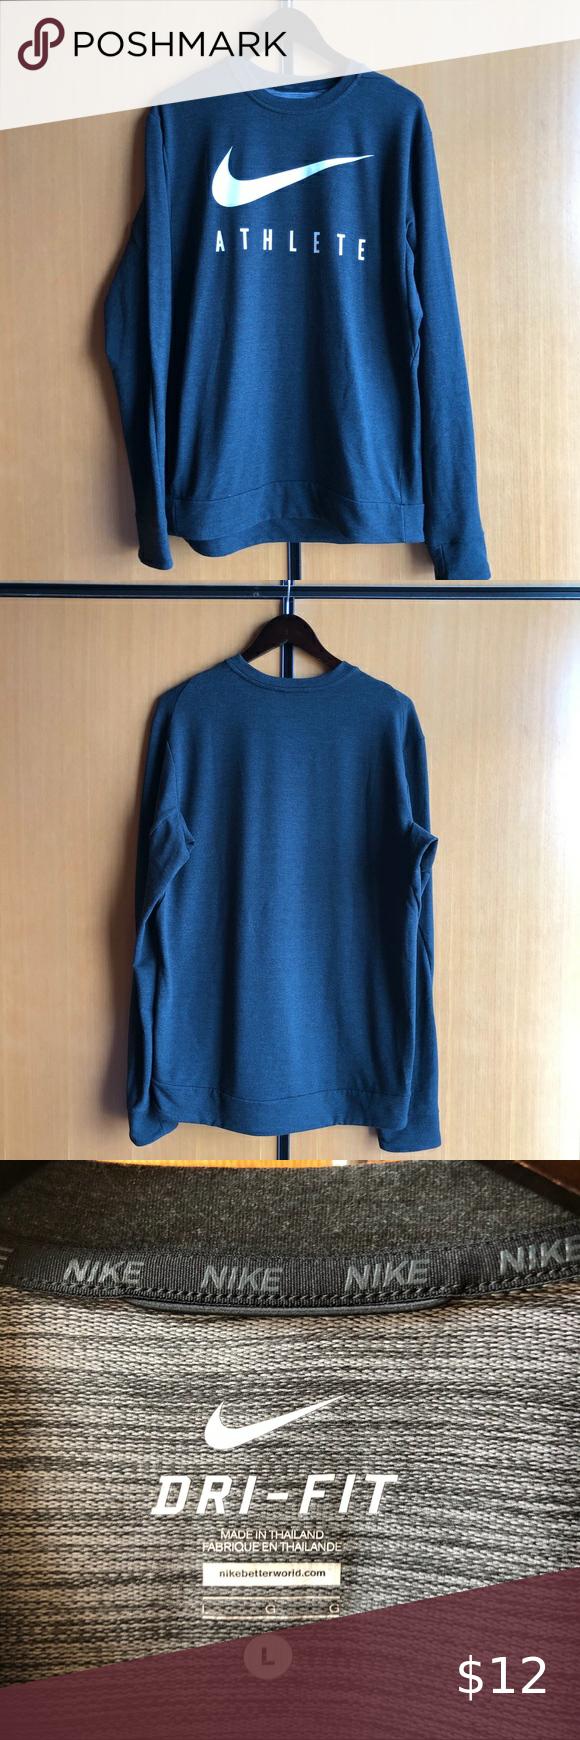 Nike Dri Fit Sweatshirt Sweatshirts Workout Sweatshirt Sweatshirt Shirt [ 1740 x 580 Pixel ]